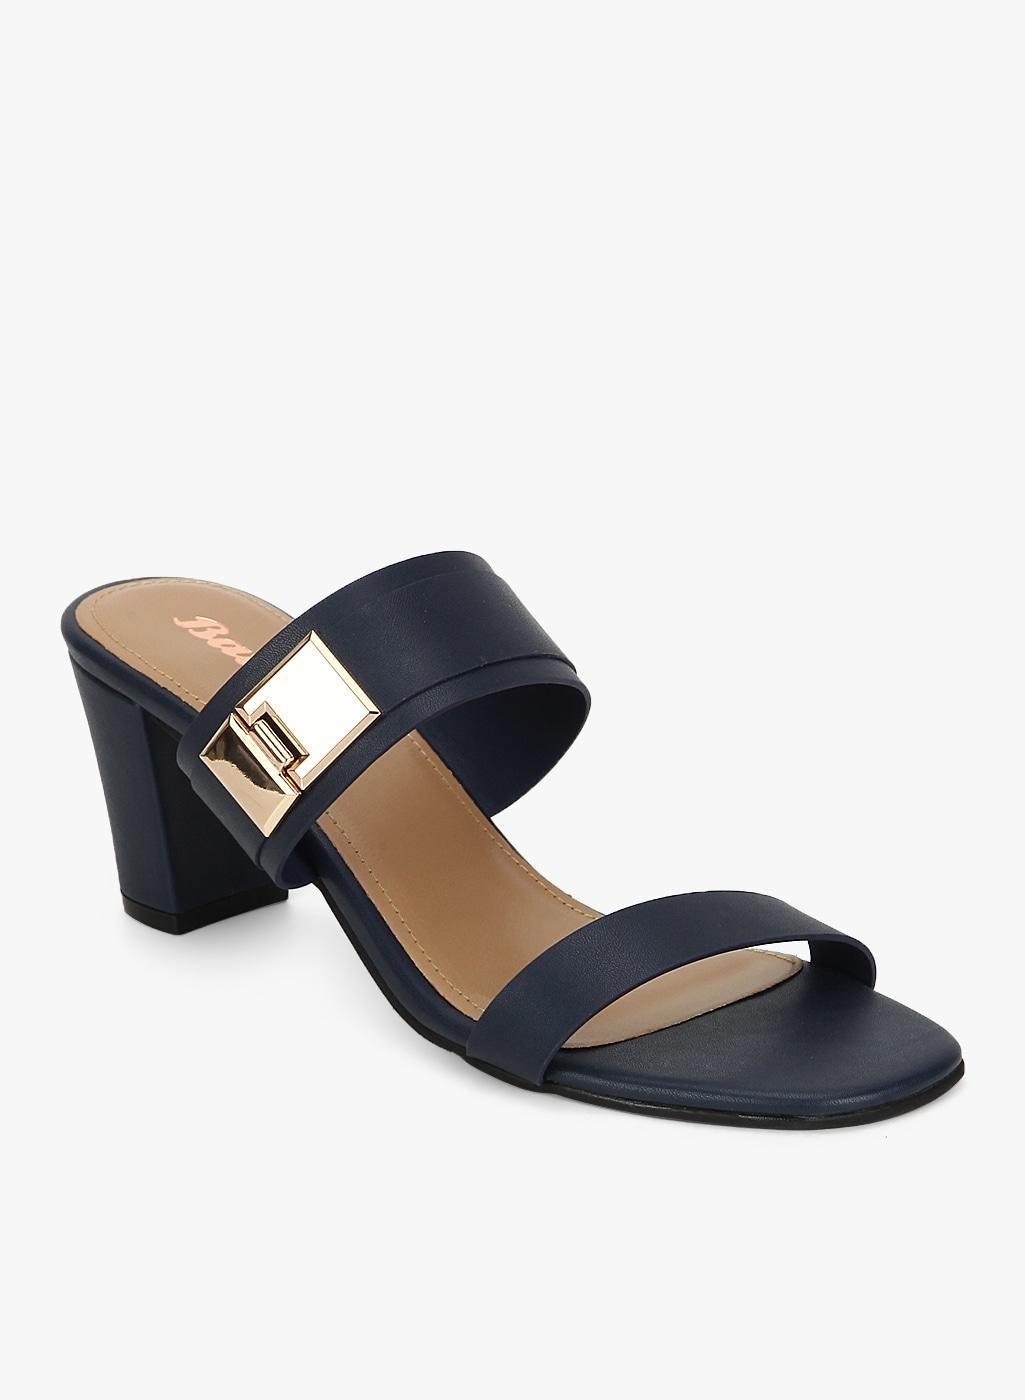 0c083d71ba3b Bata Elastic NAVY BLUE SANDALS for women - Get stylish shoes for ...